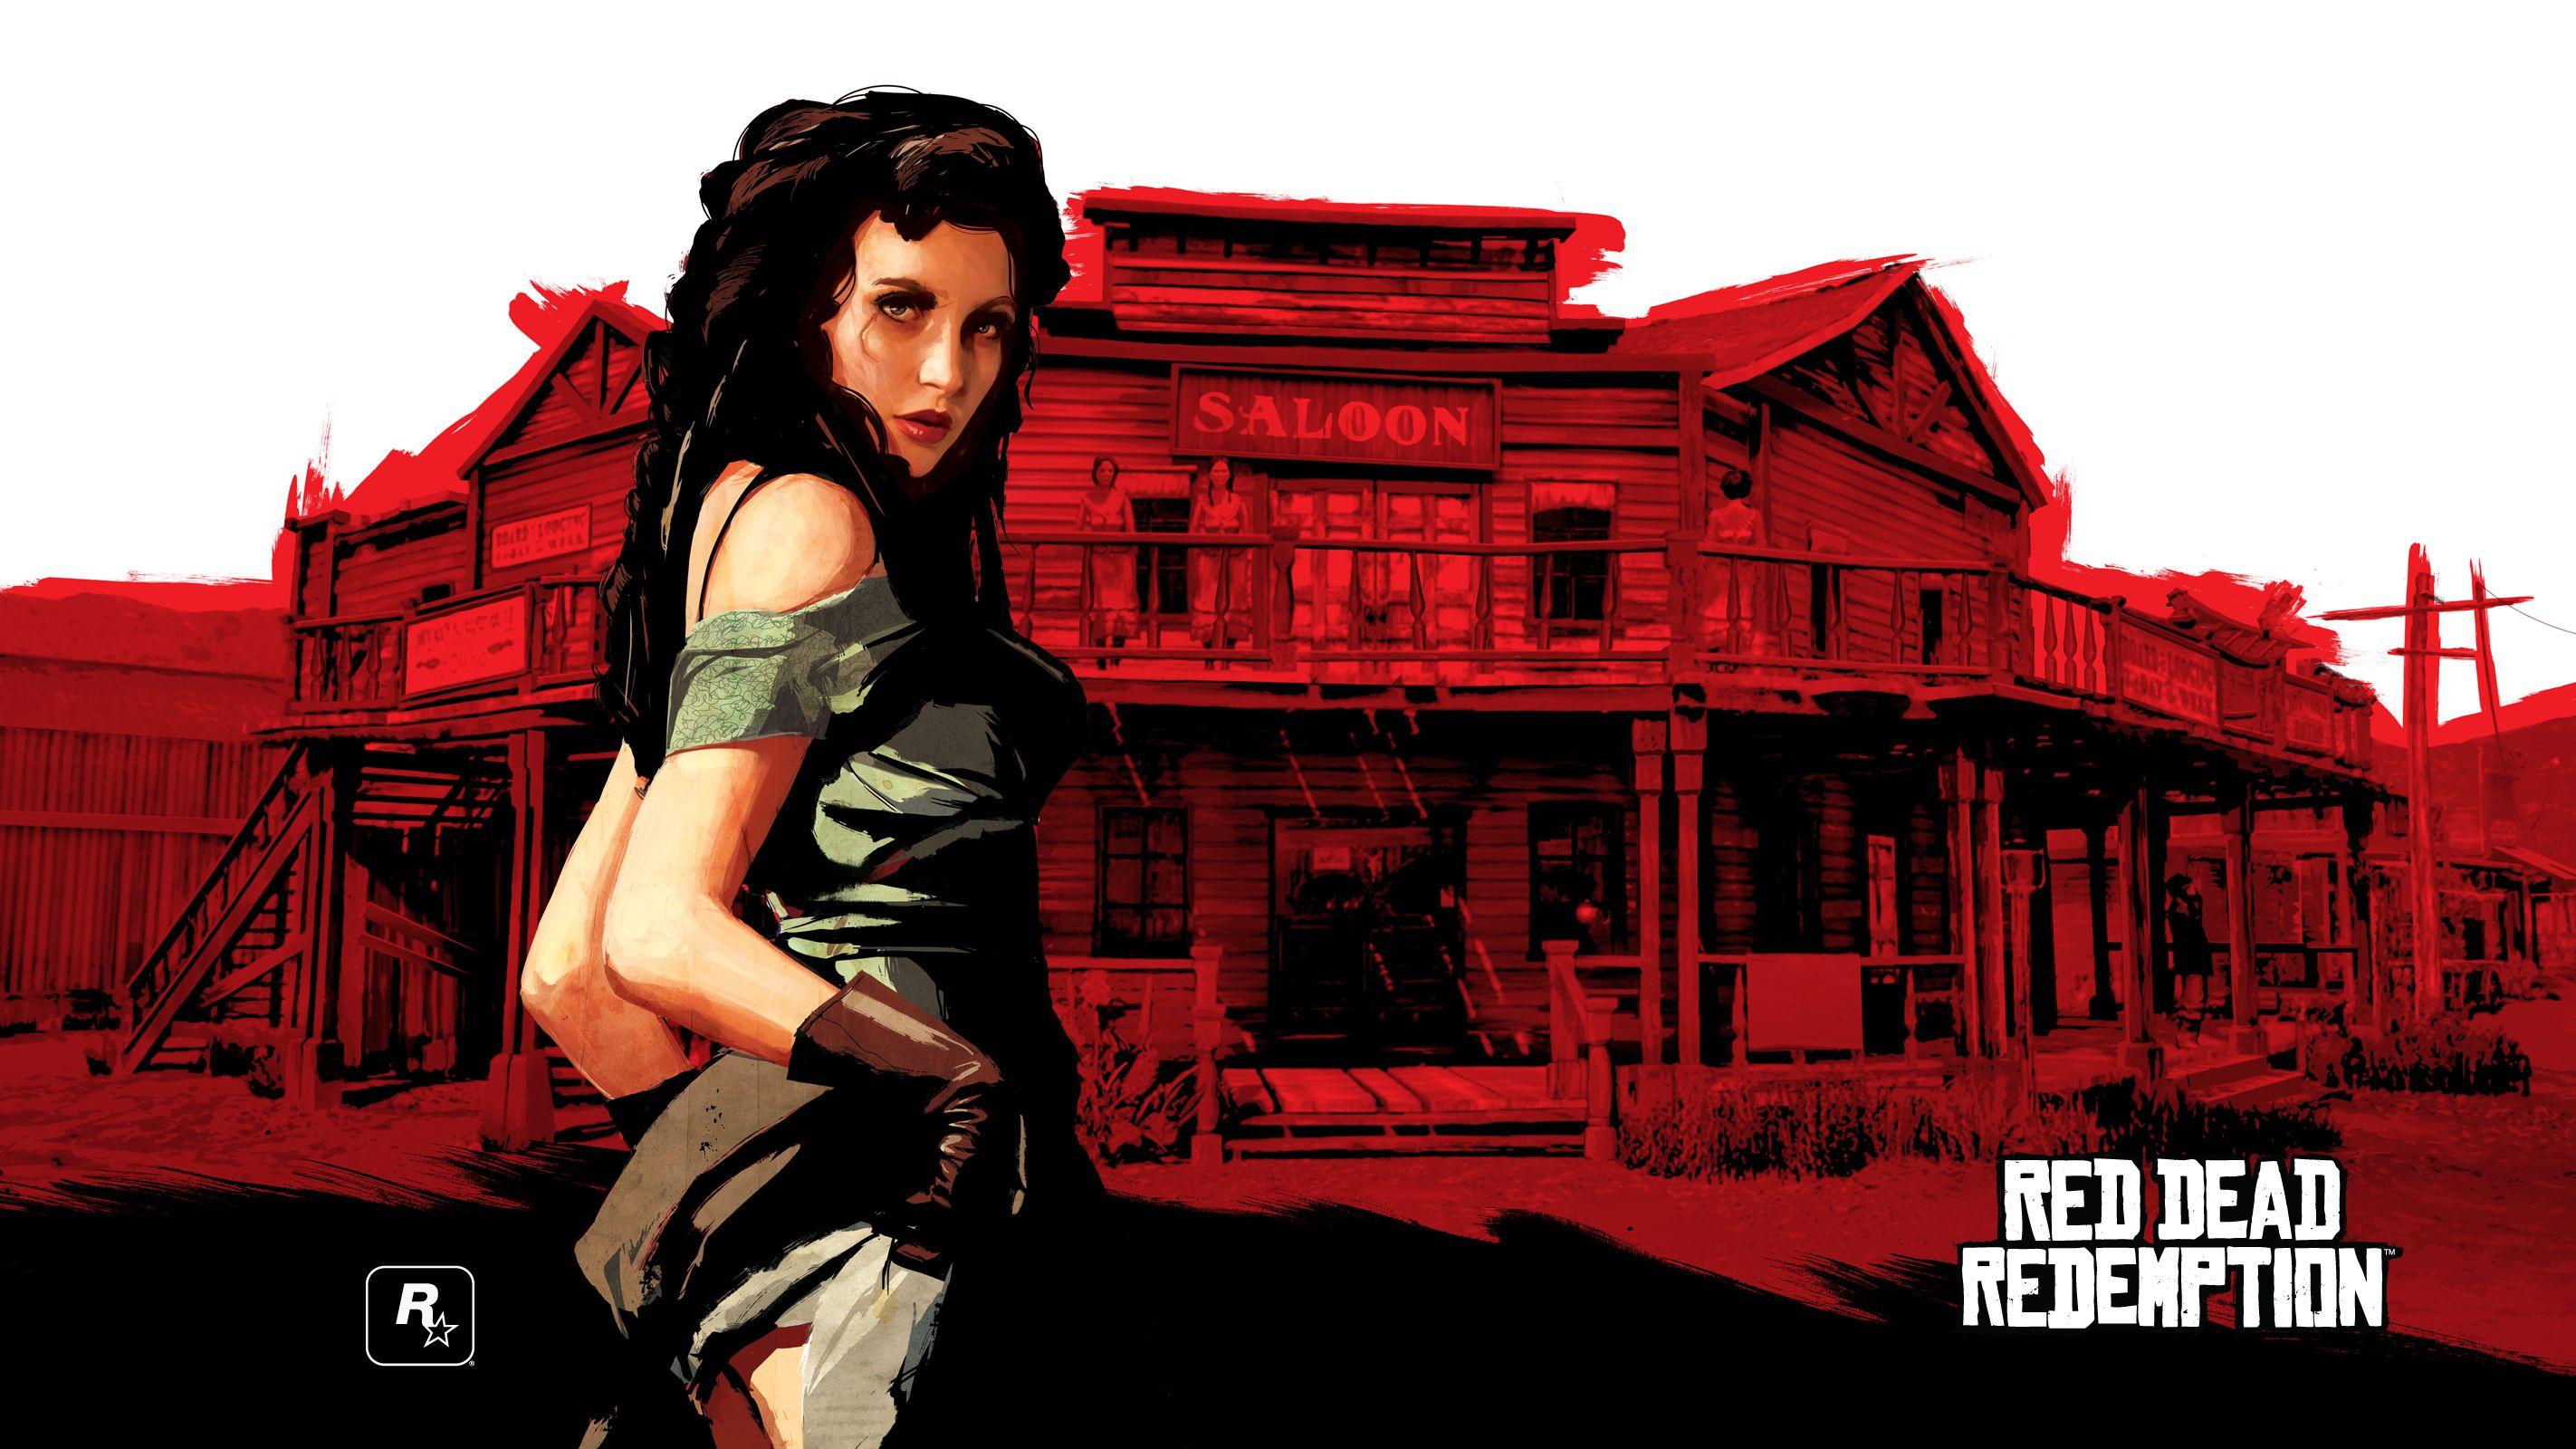 Red Dead Redemption Concept Art Red Dead Redemption Concept Art